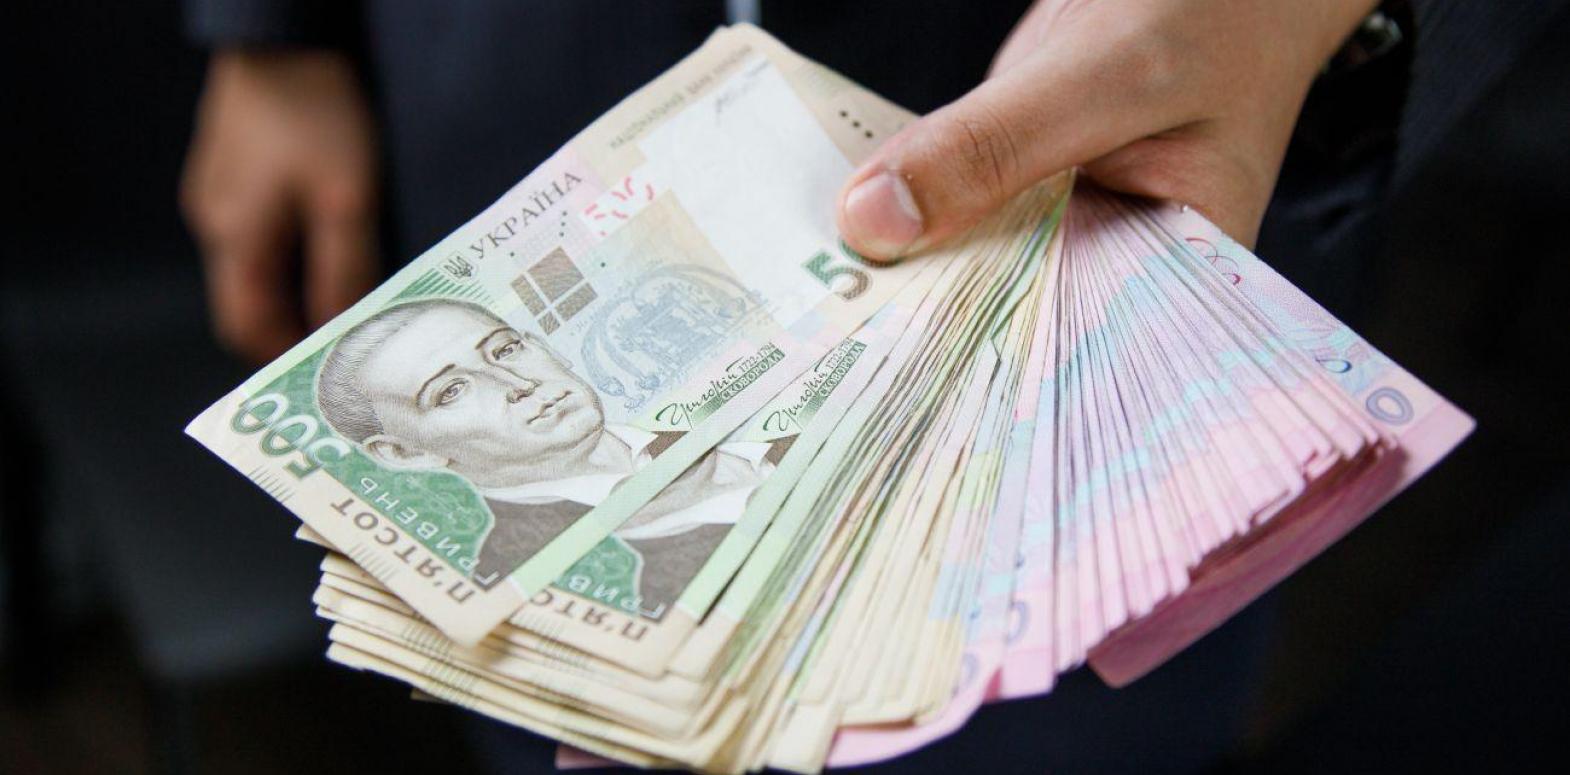 Средняя зарплата в Украине за месяц упала на 350 гривен